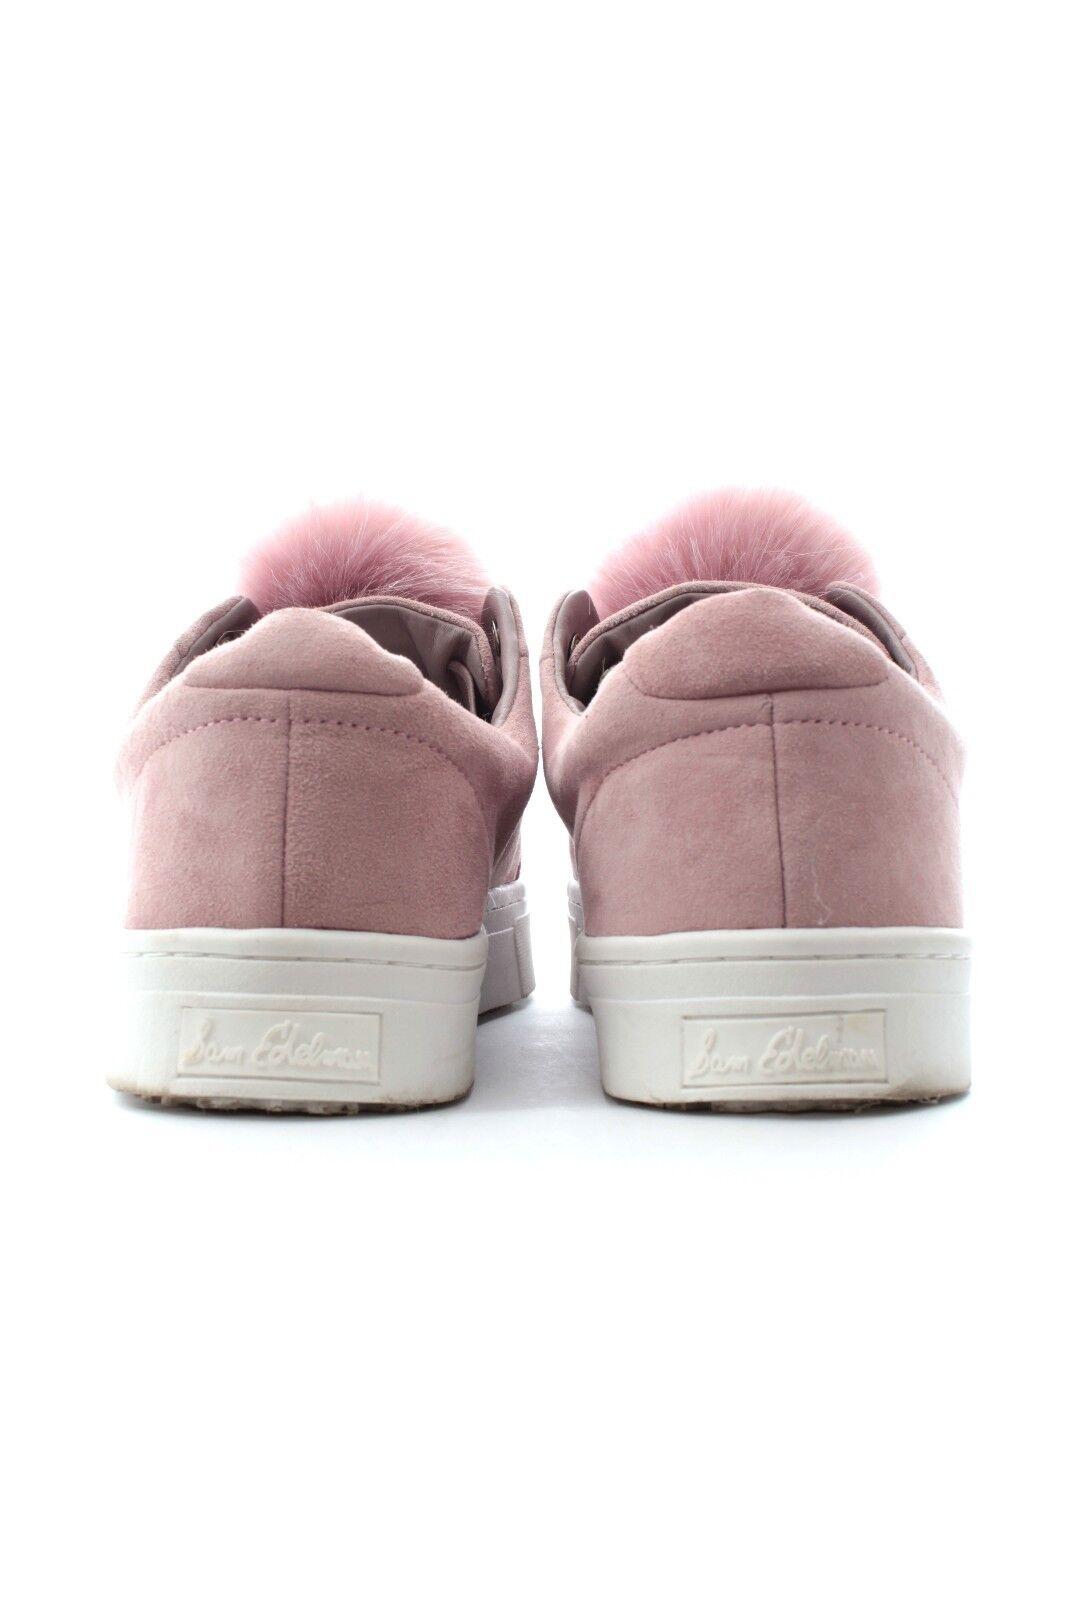 Sam Edelman Leya Faux Fur-Trimmed Sneakers   Pink       85b7a2